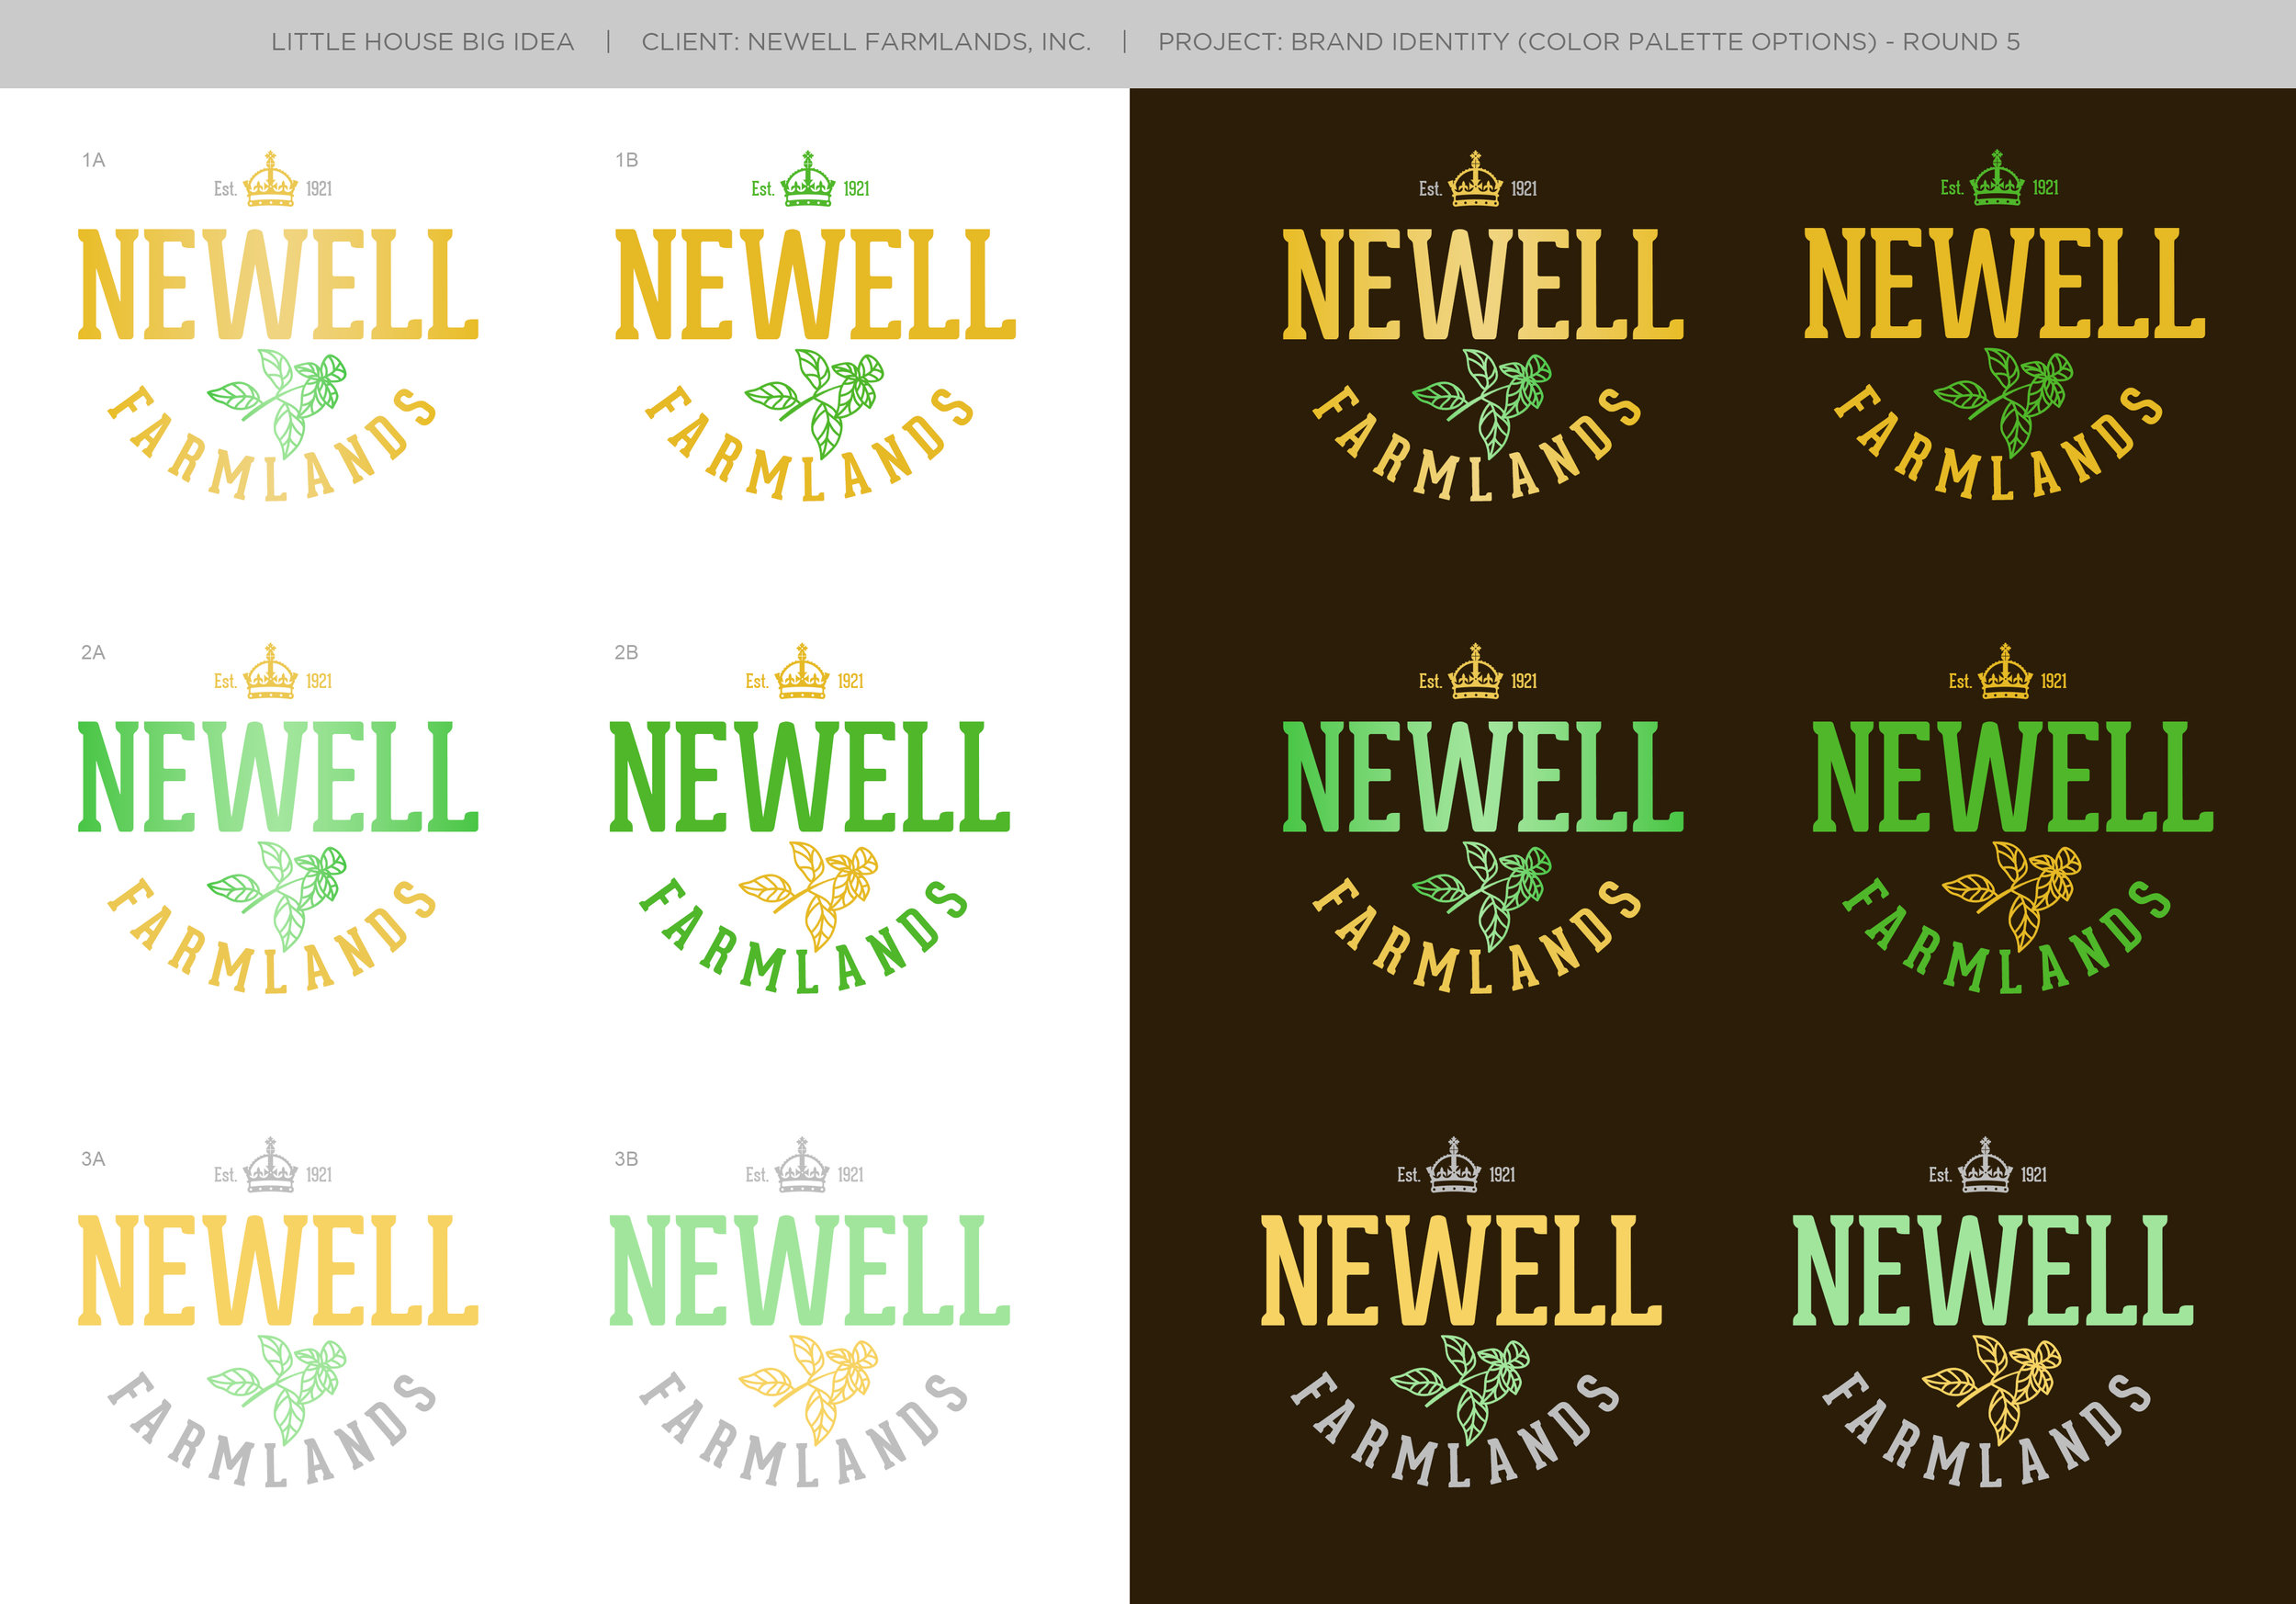 LHBI_NewellFarmlands_ColorPalette_Round5_02.07.17.jpg